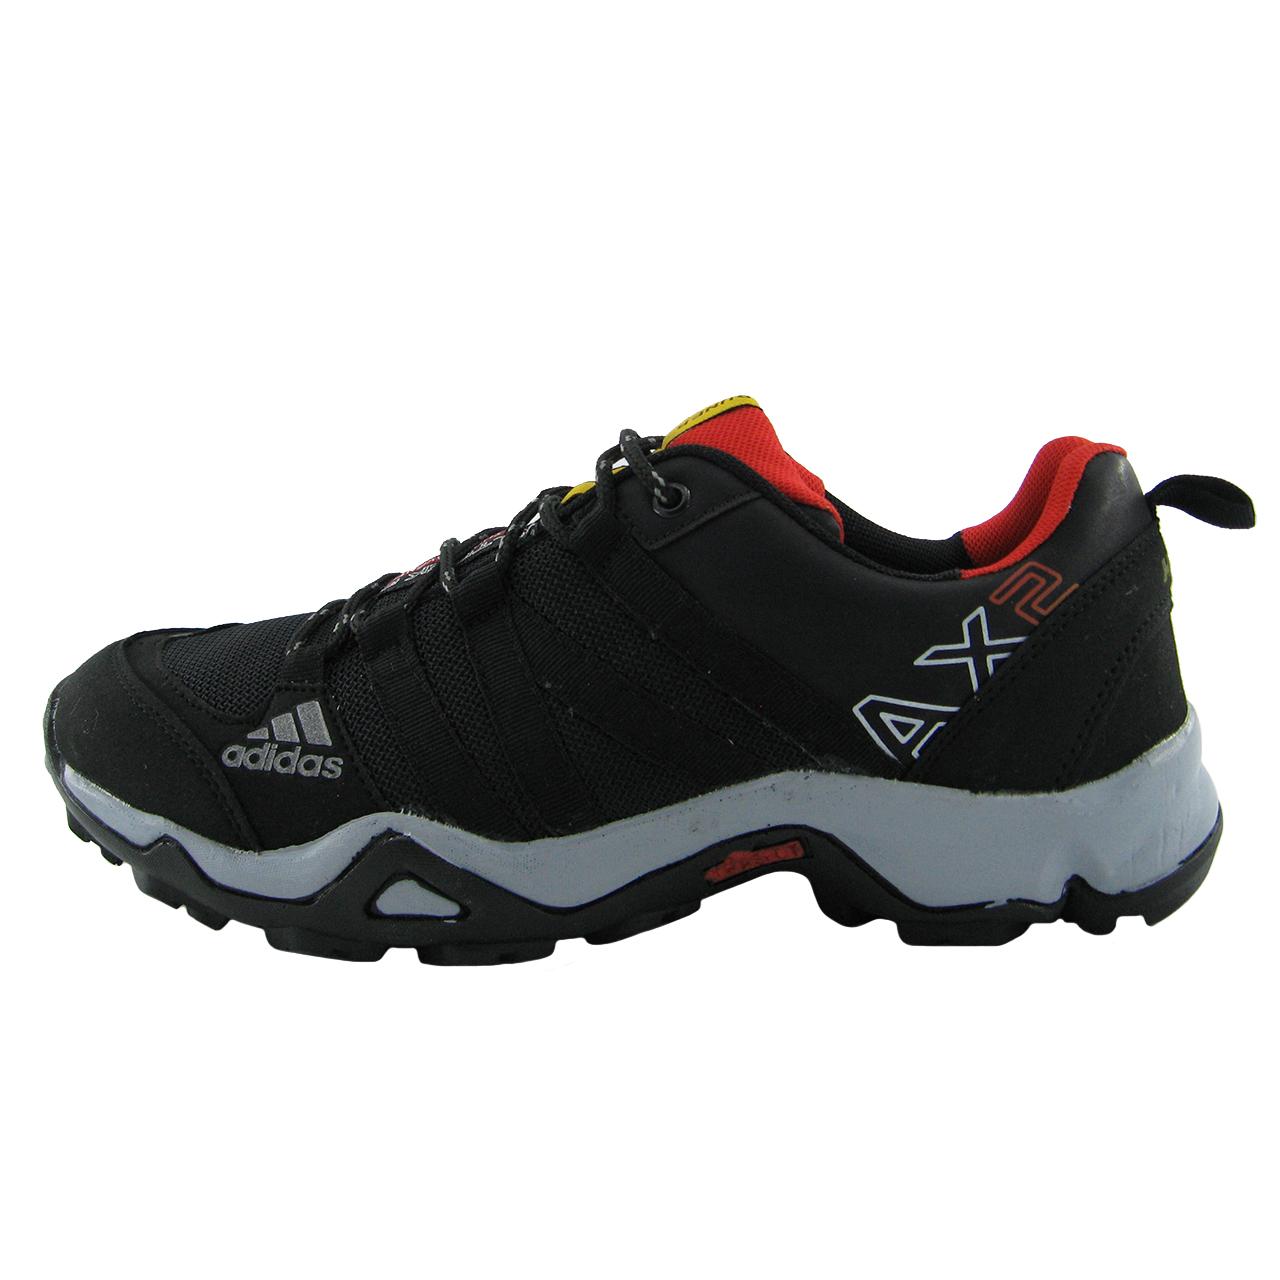 خرید اینترنتی                     کفش کوهنوردی مردانه کد AX-2-B